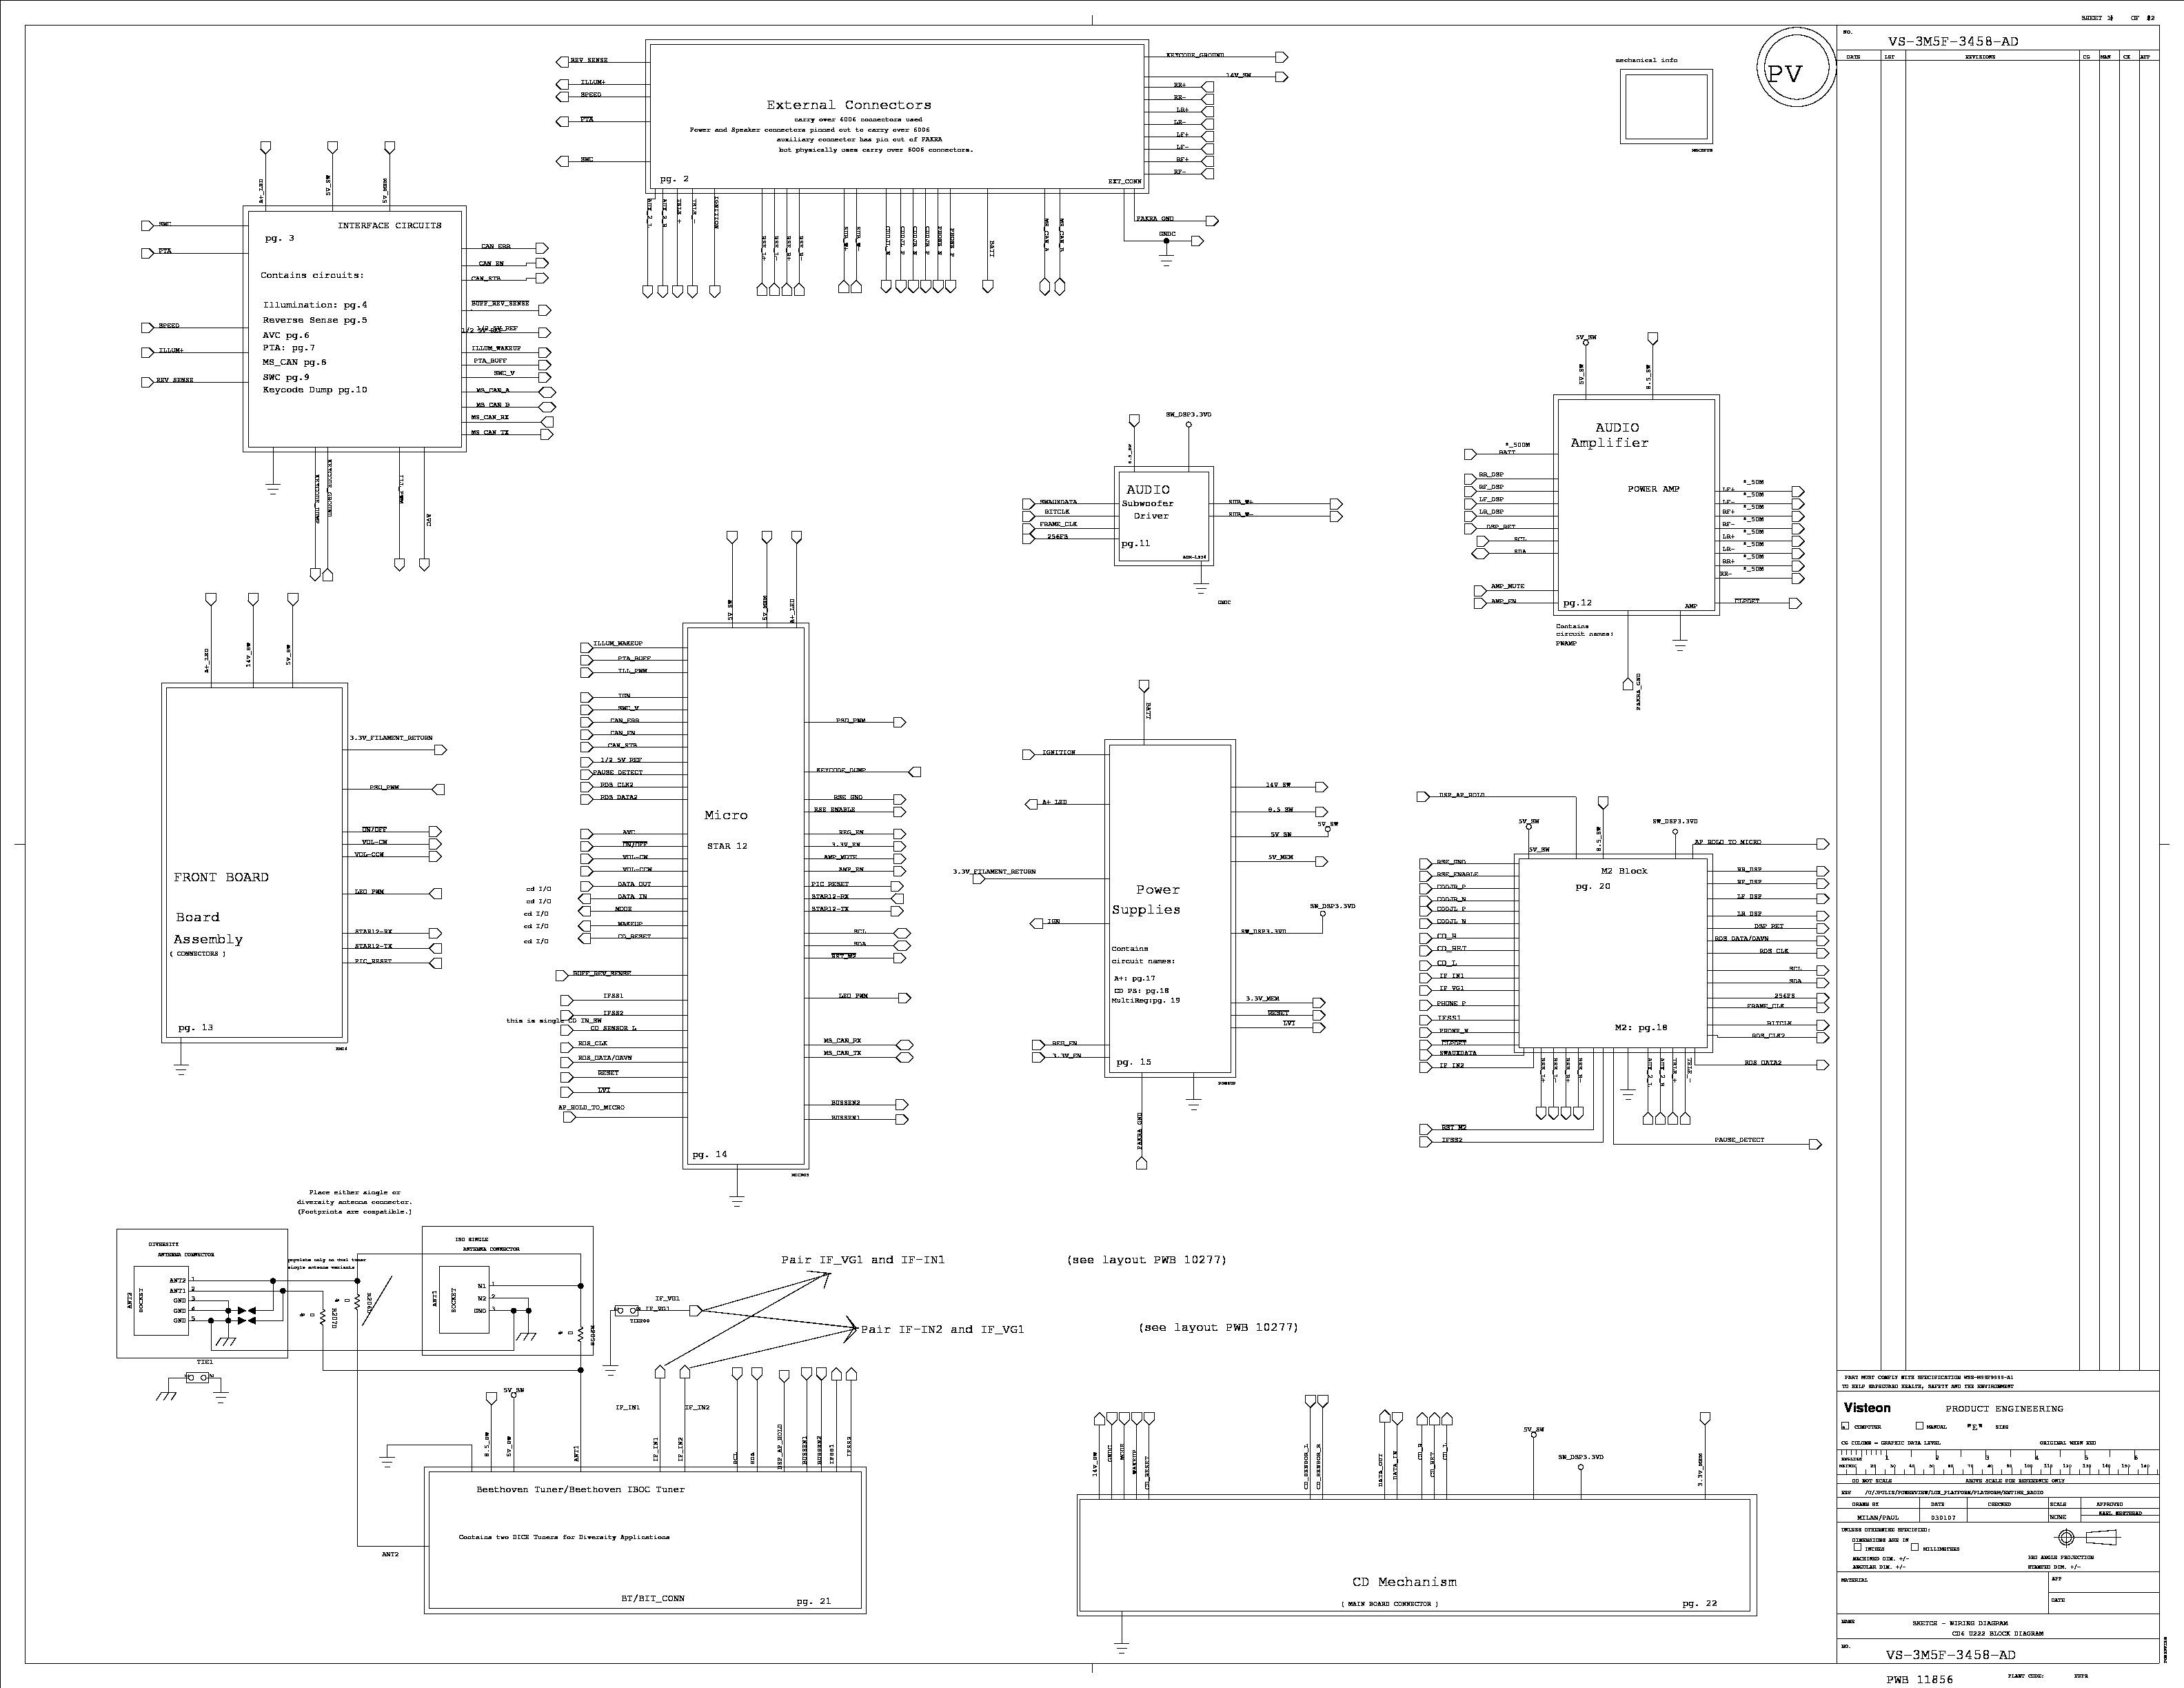 sony car audio service manuals and schematics repair information rh servlib com Sony Xplod CD Player Wiring Sony Deck Wiring-Diagram